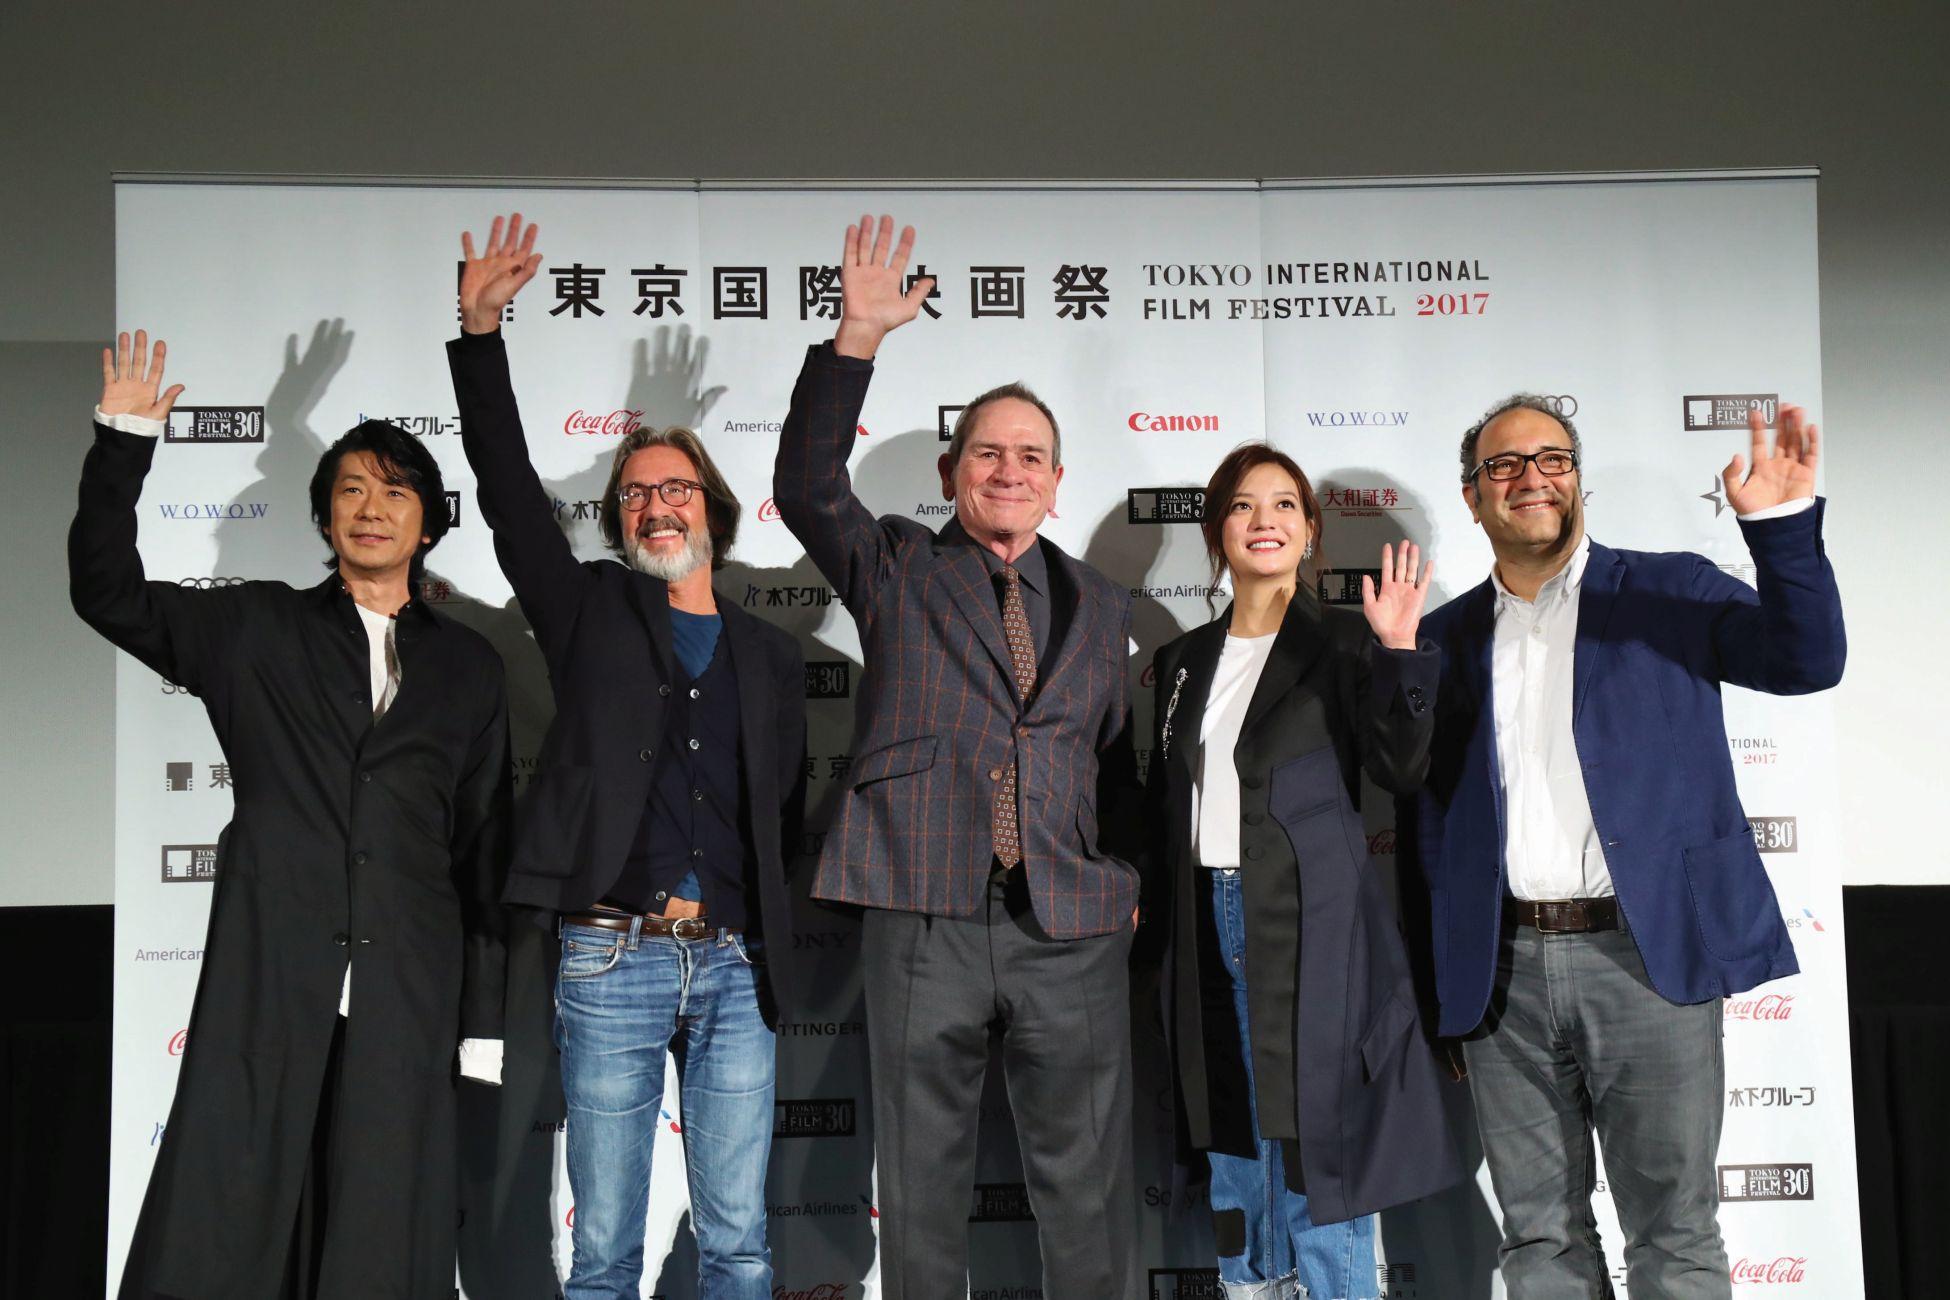 Tuomaristo / Competition (c)2017 TIFF